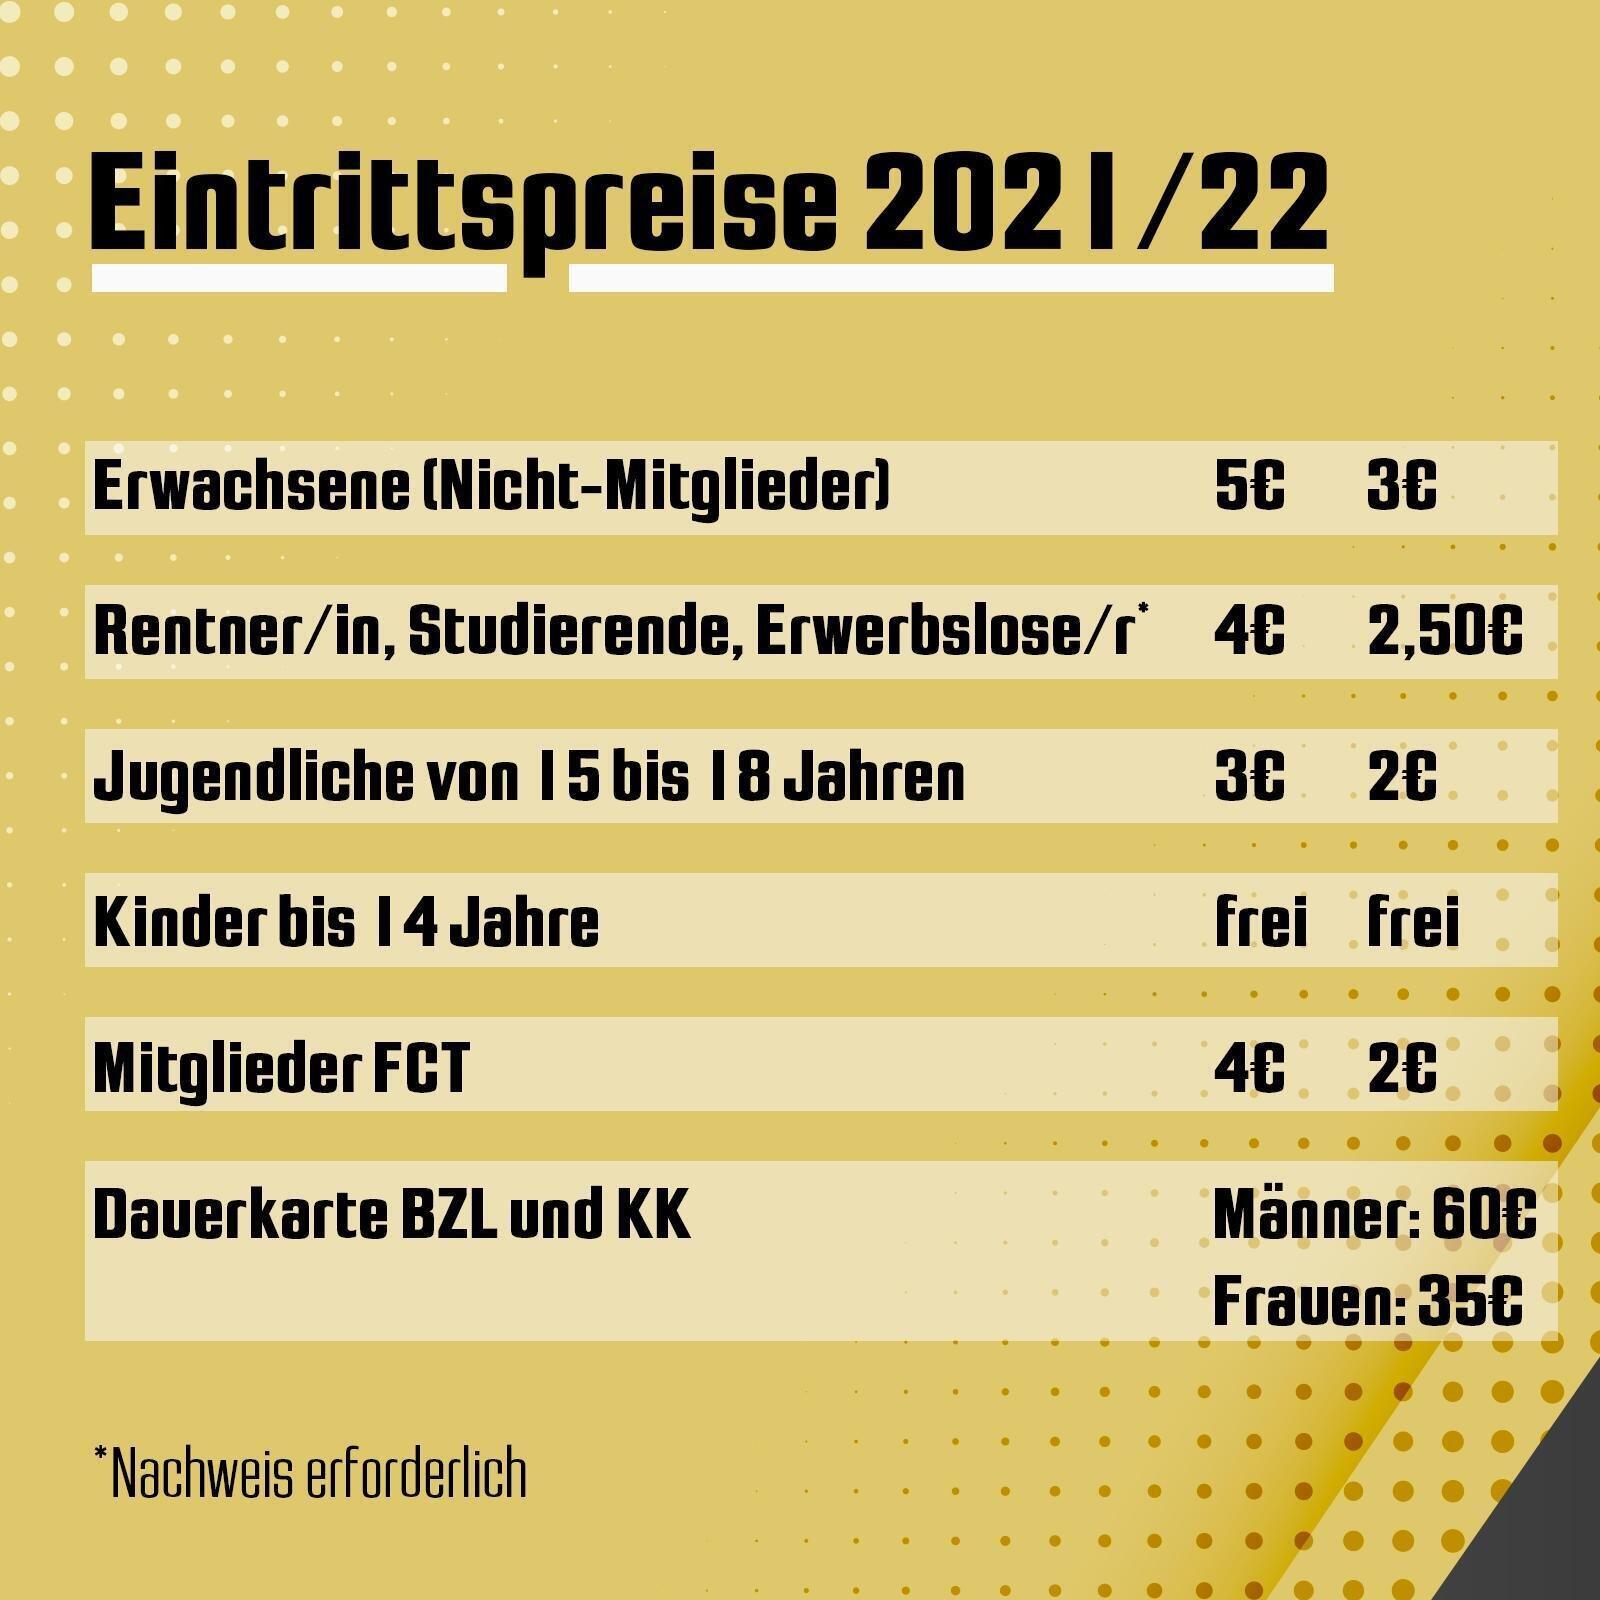 Eintrittspreise Saison 2021/20222